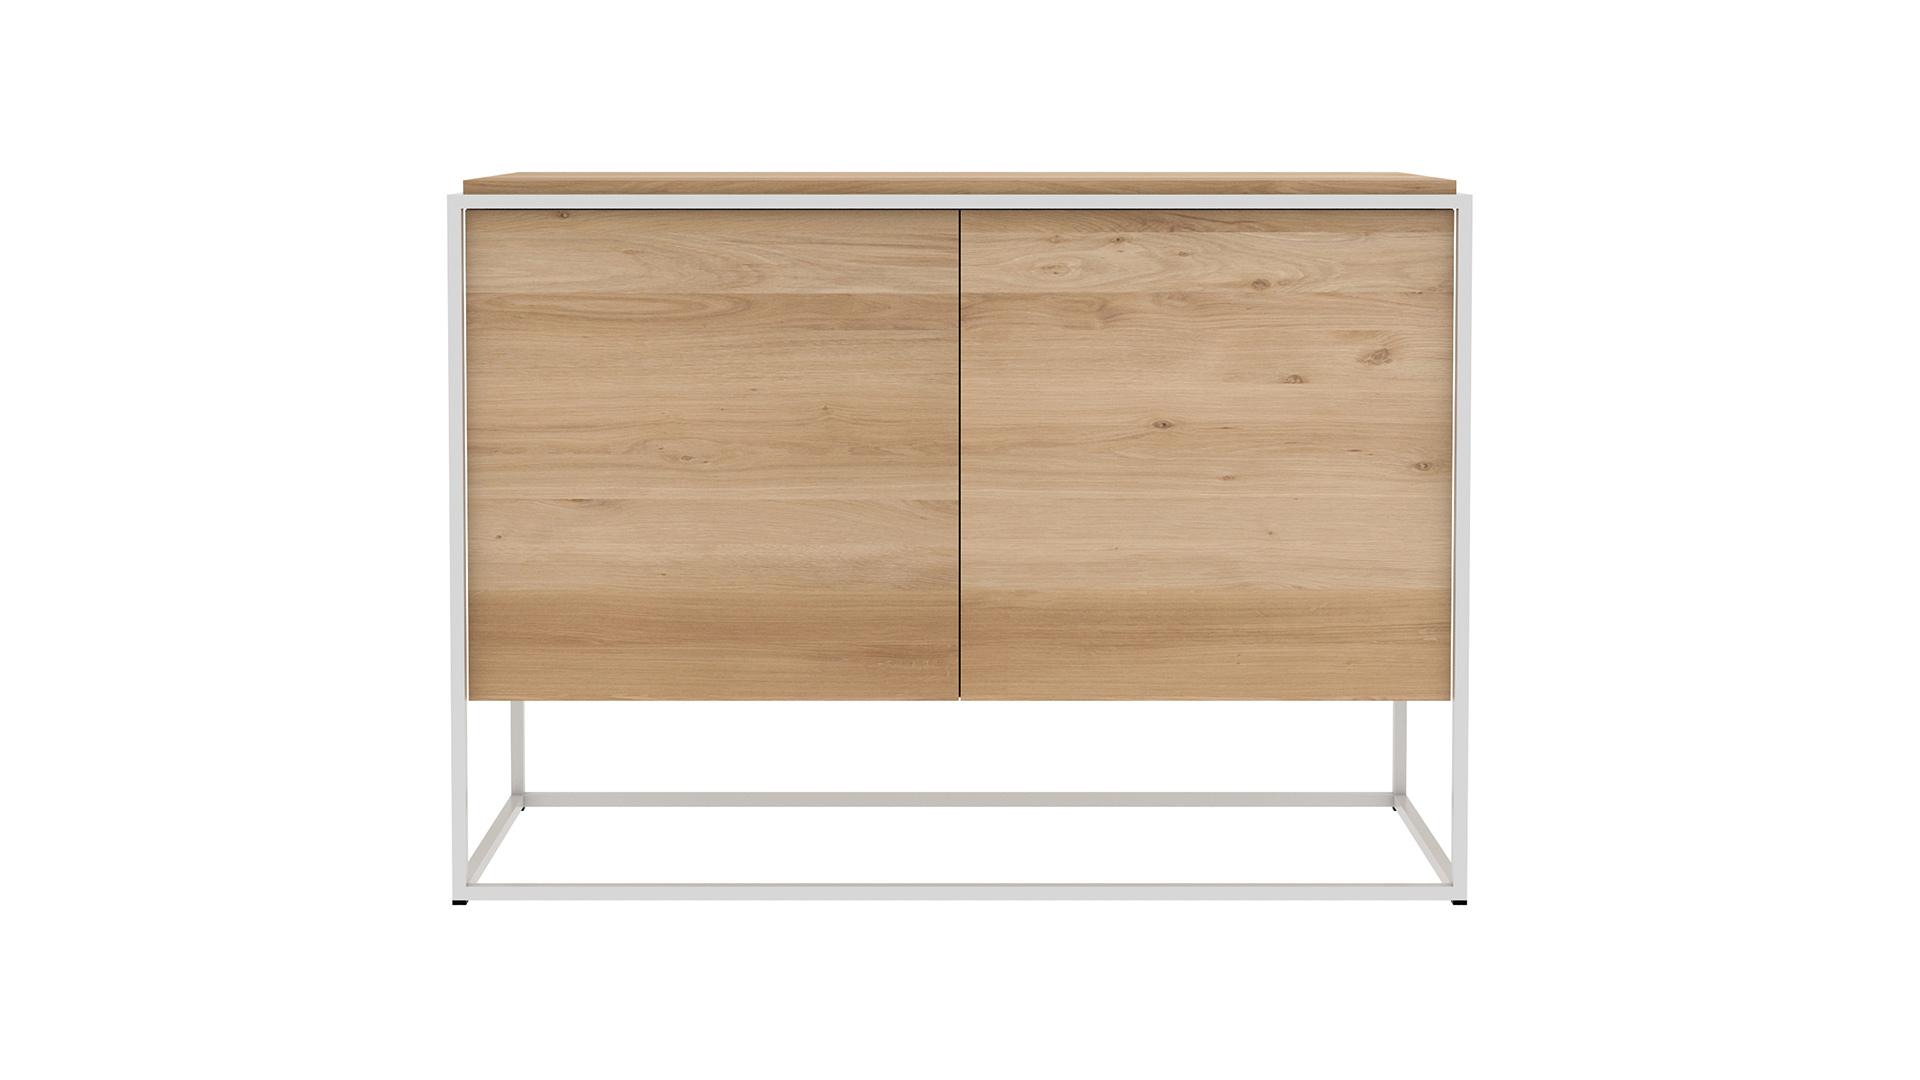 Ethnicraft-Monolit-cupboard-Oak-front-white-frame